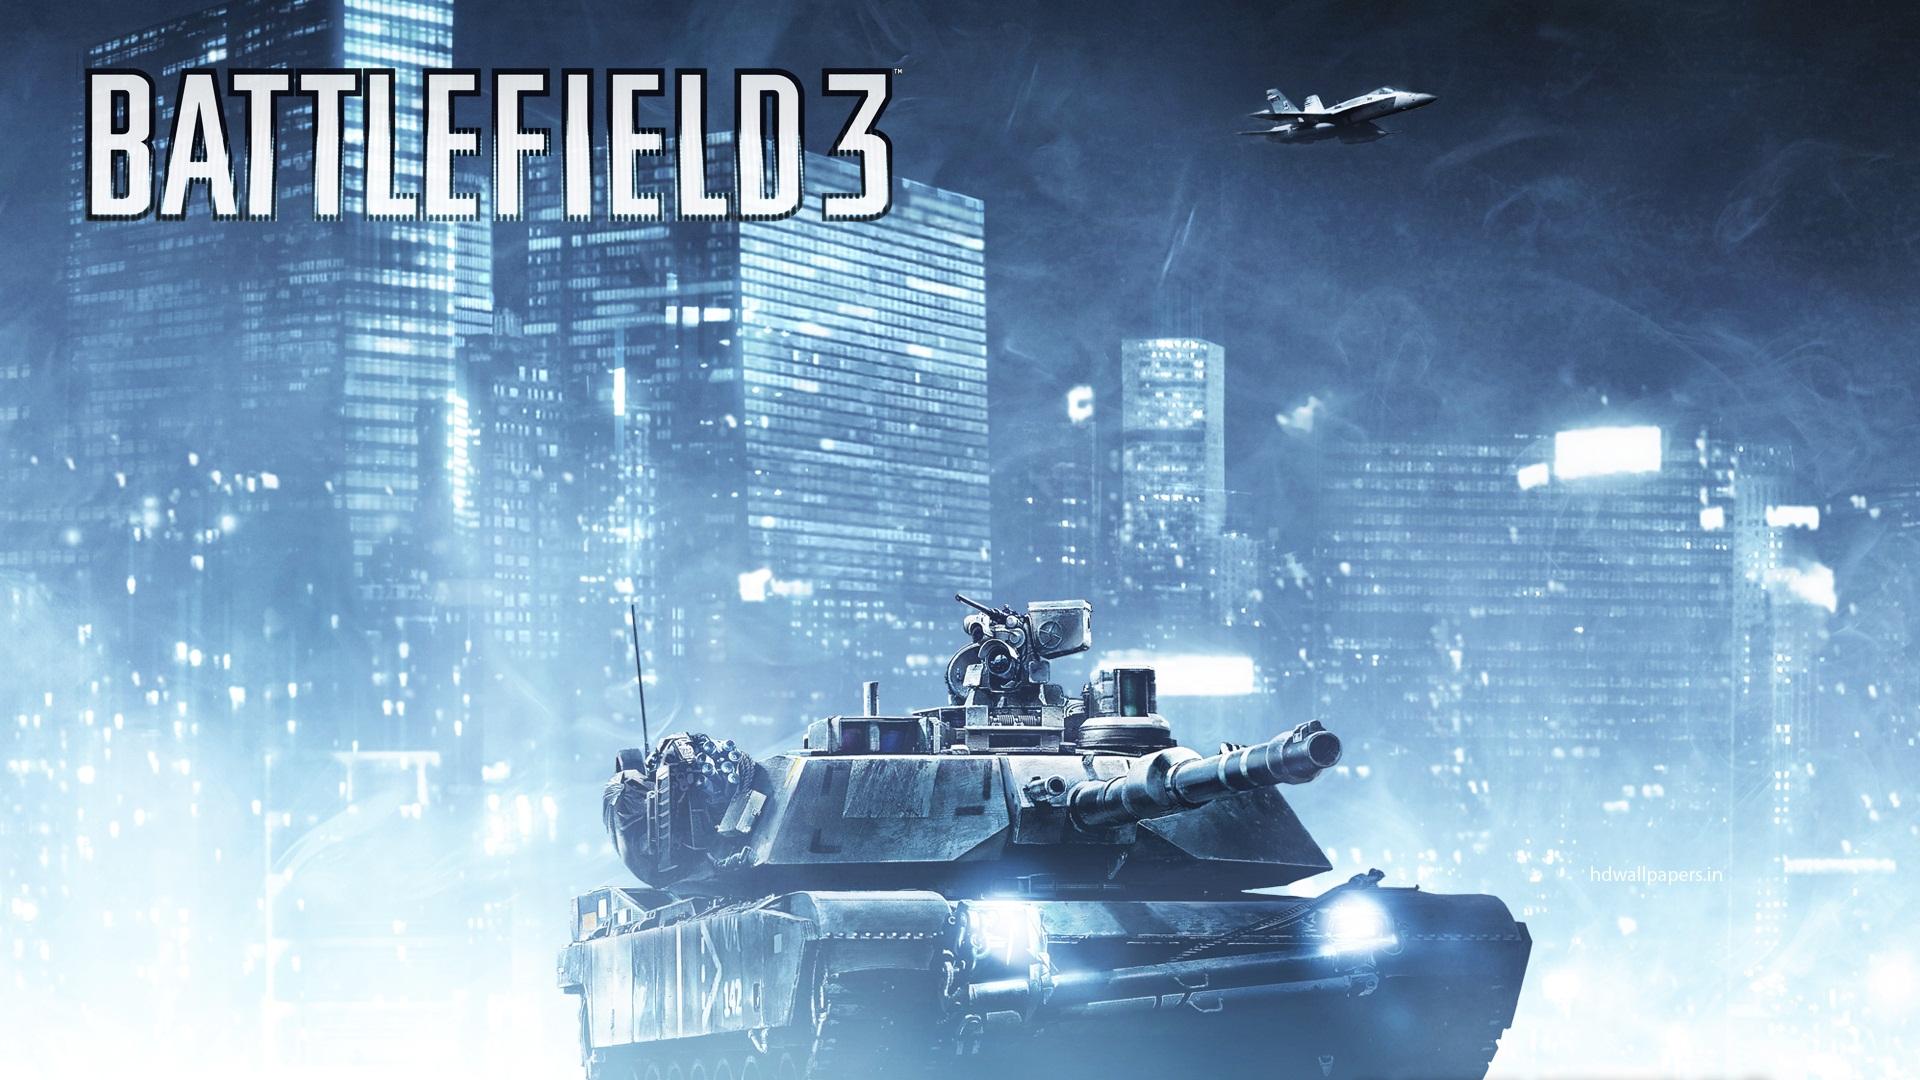 Battlefield 3 War 1080p HD PC Games Wallpapes Res 1920x1080 HD 1920x1080